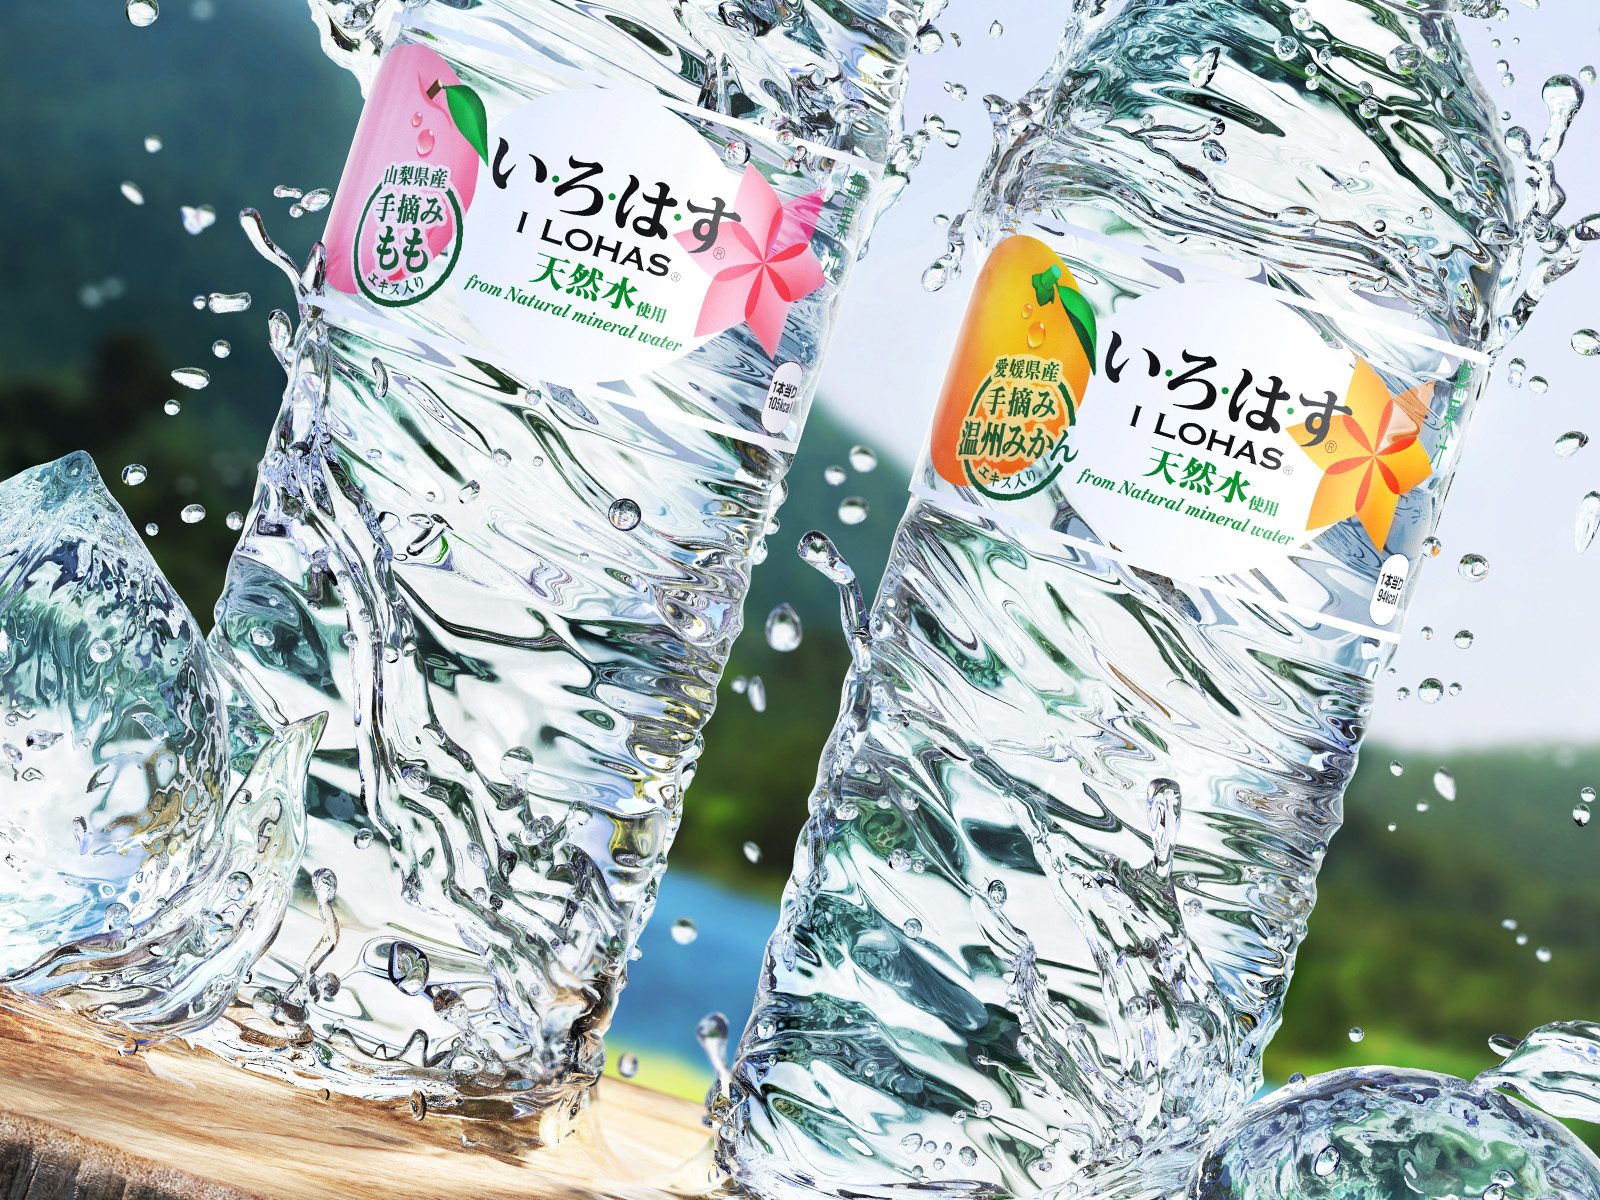 Ilhoas Water JPN